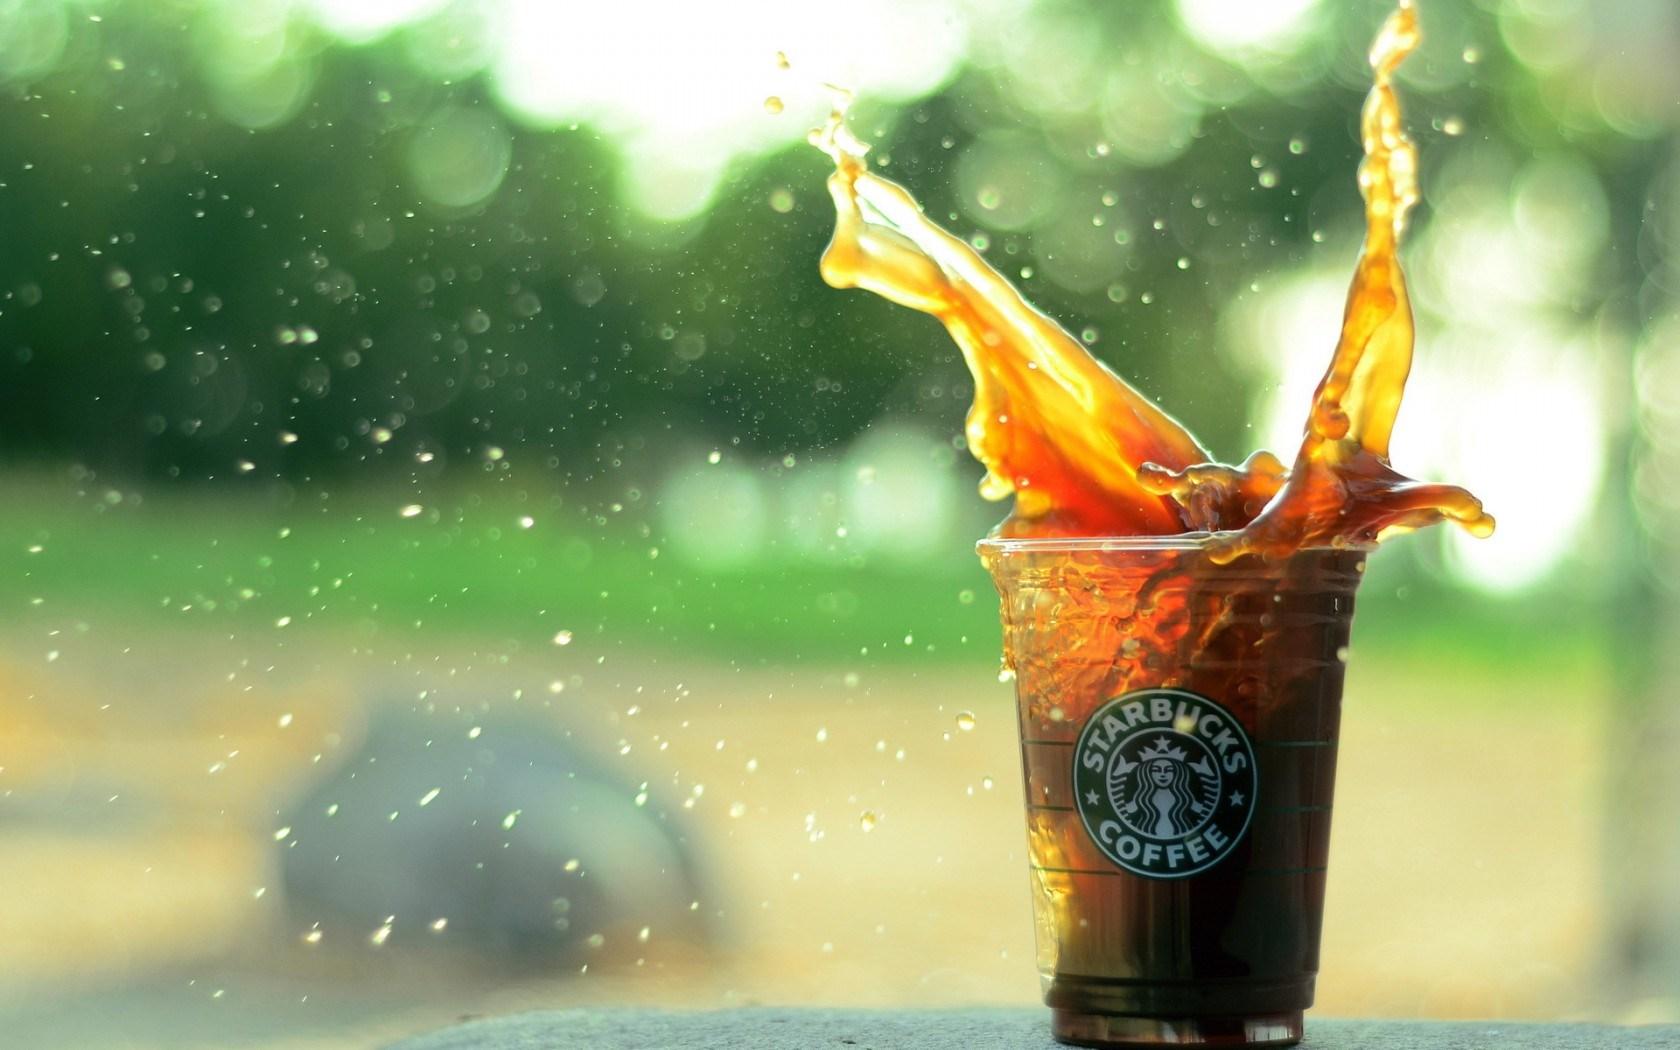 Starbucks Coffee Splash Spray